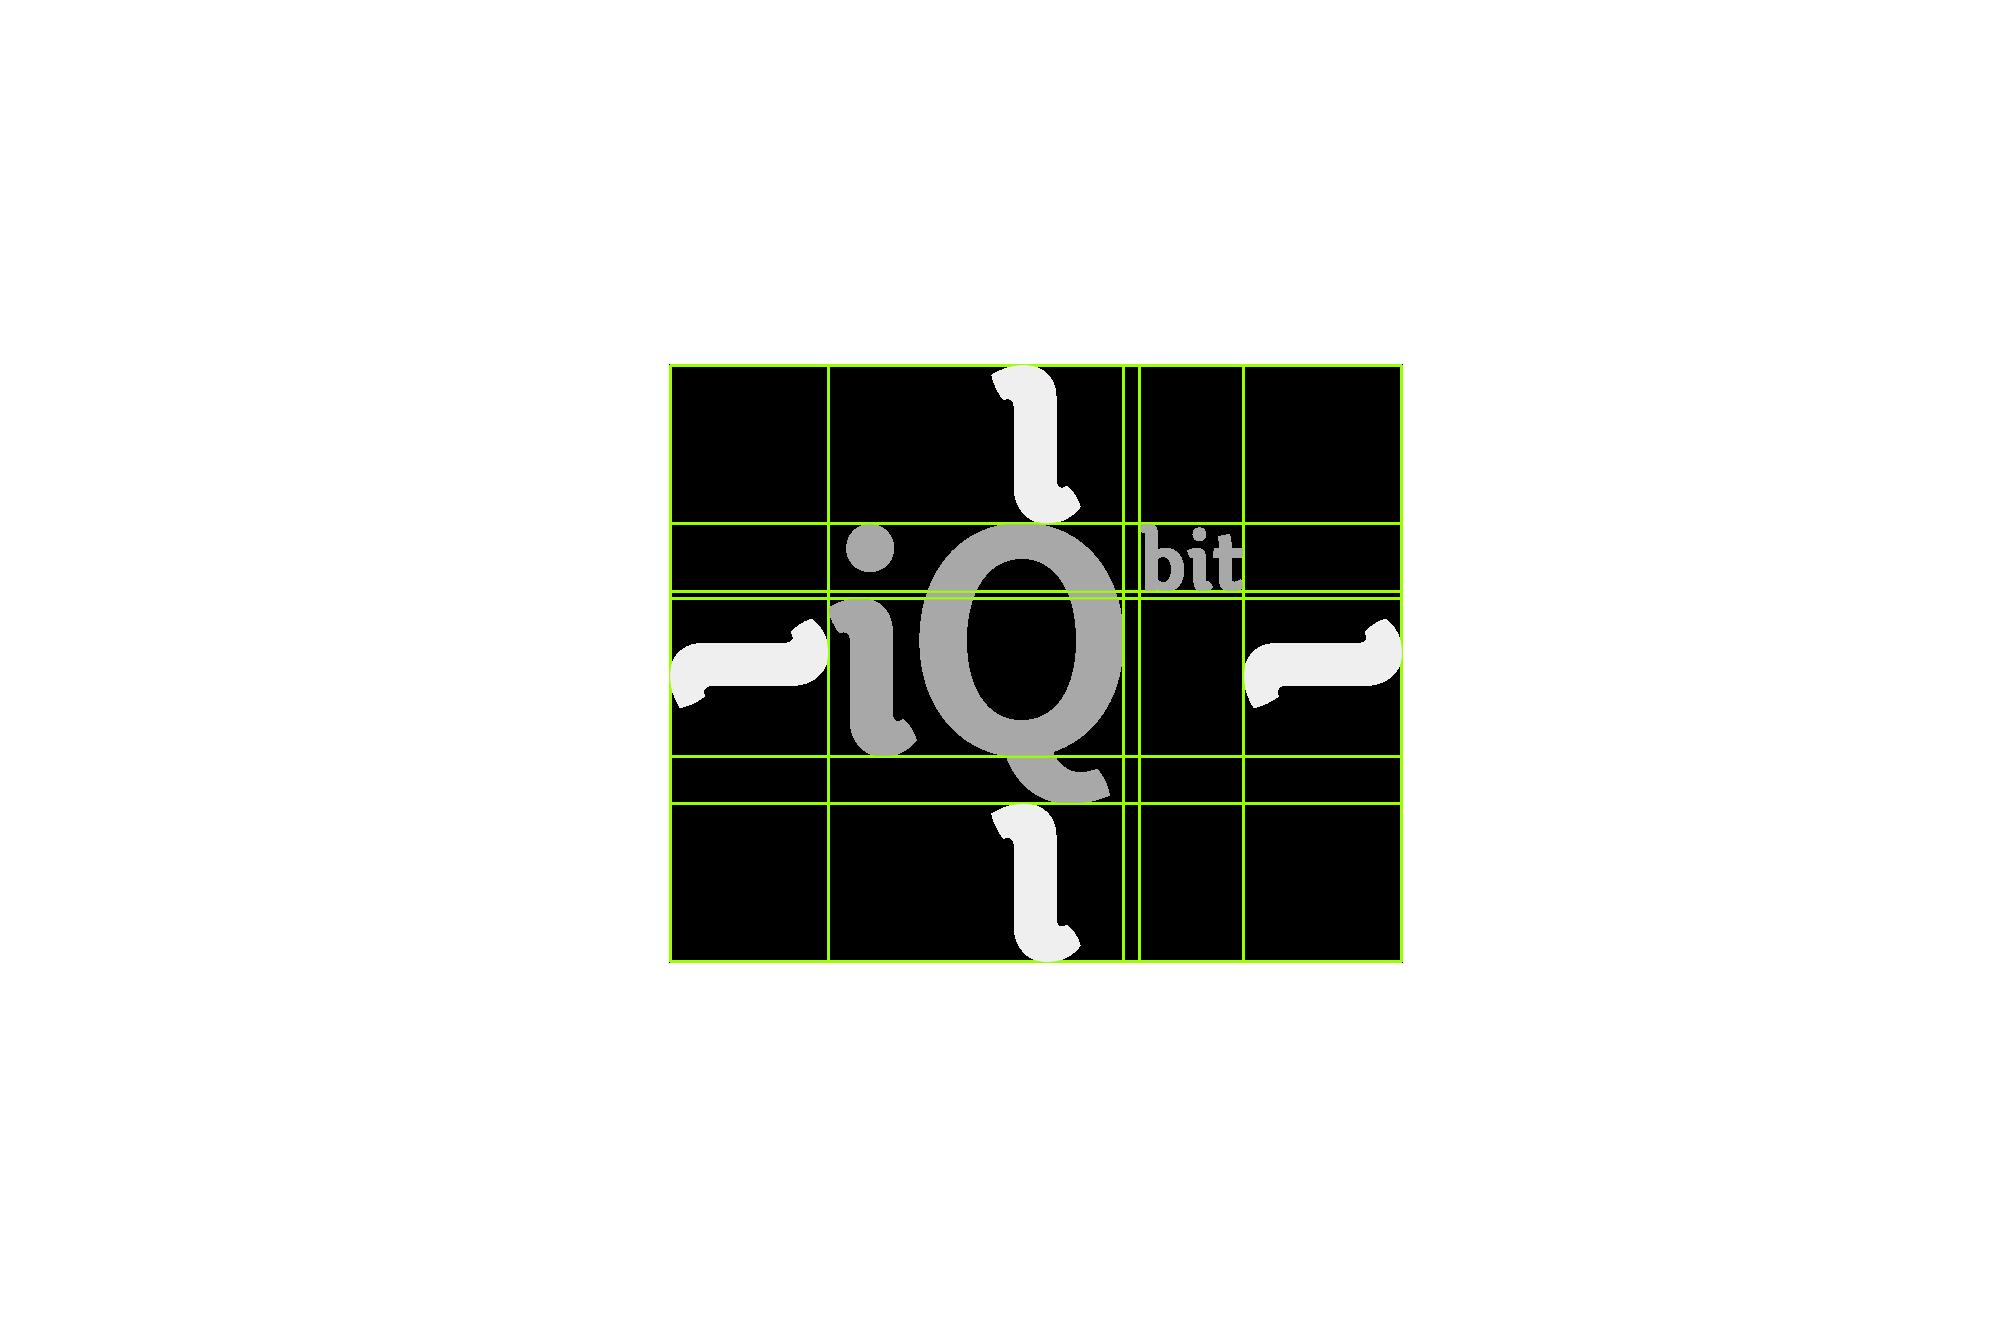 raniev-rod-alvarez-diseño-gráfico-queretaro-iqbit-14-grid